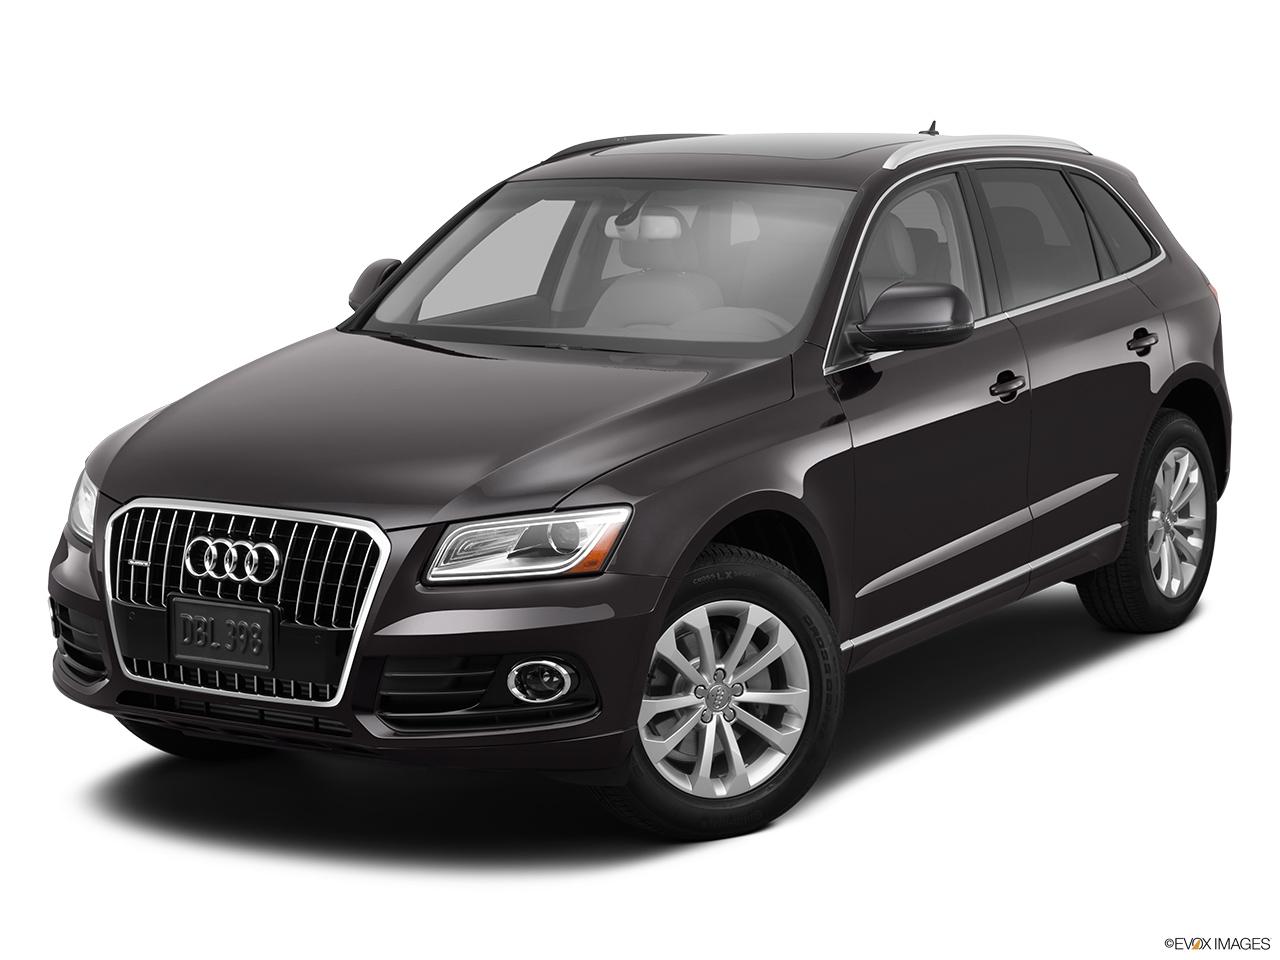 2014 audi q5 quattro 2 0t premium plus front angle view. Cars Review. Best American Auto & Cars Review